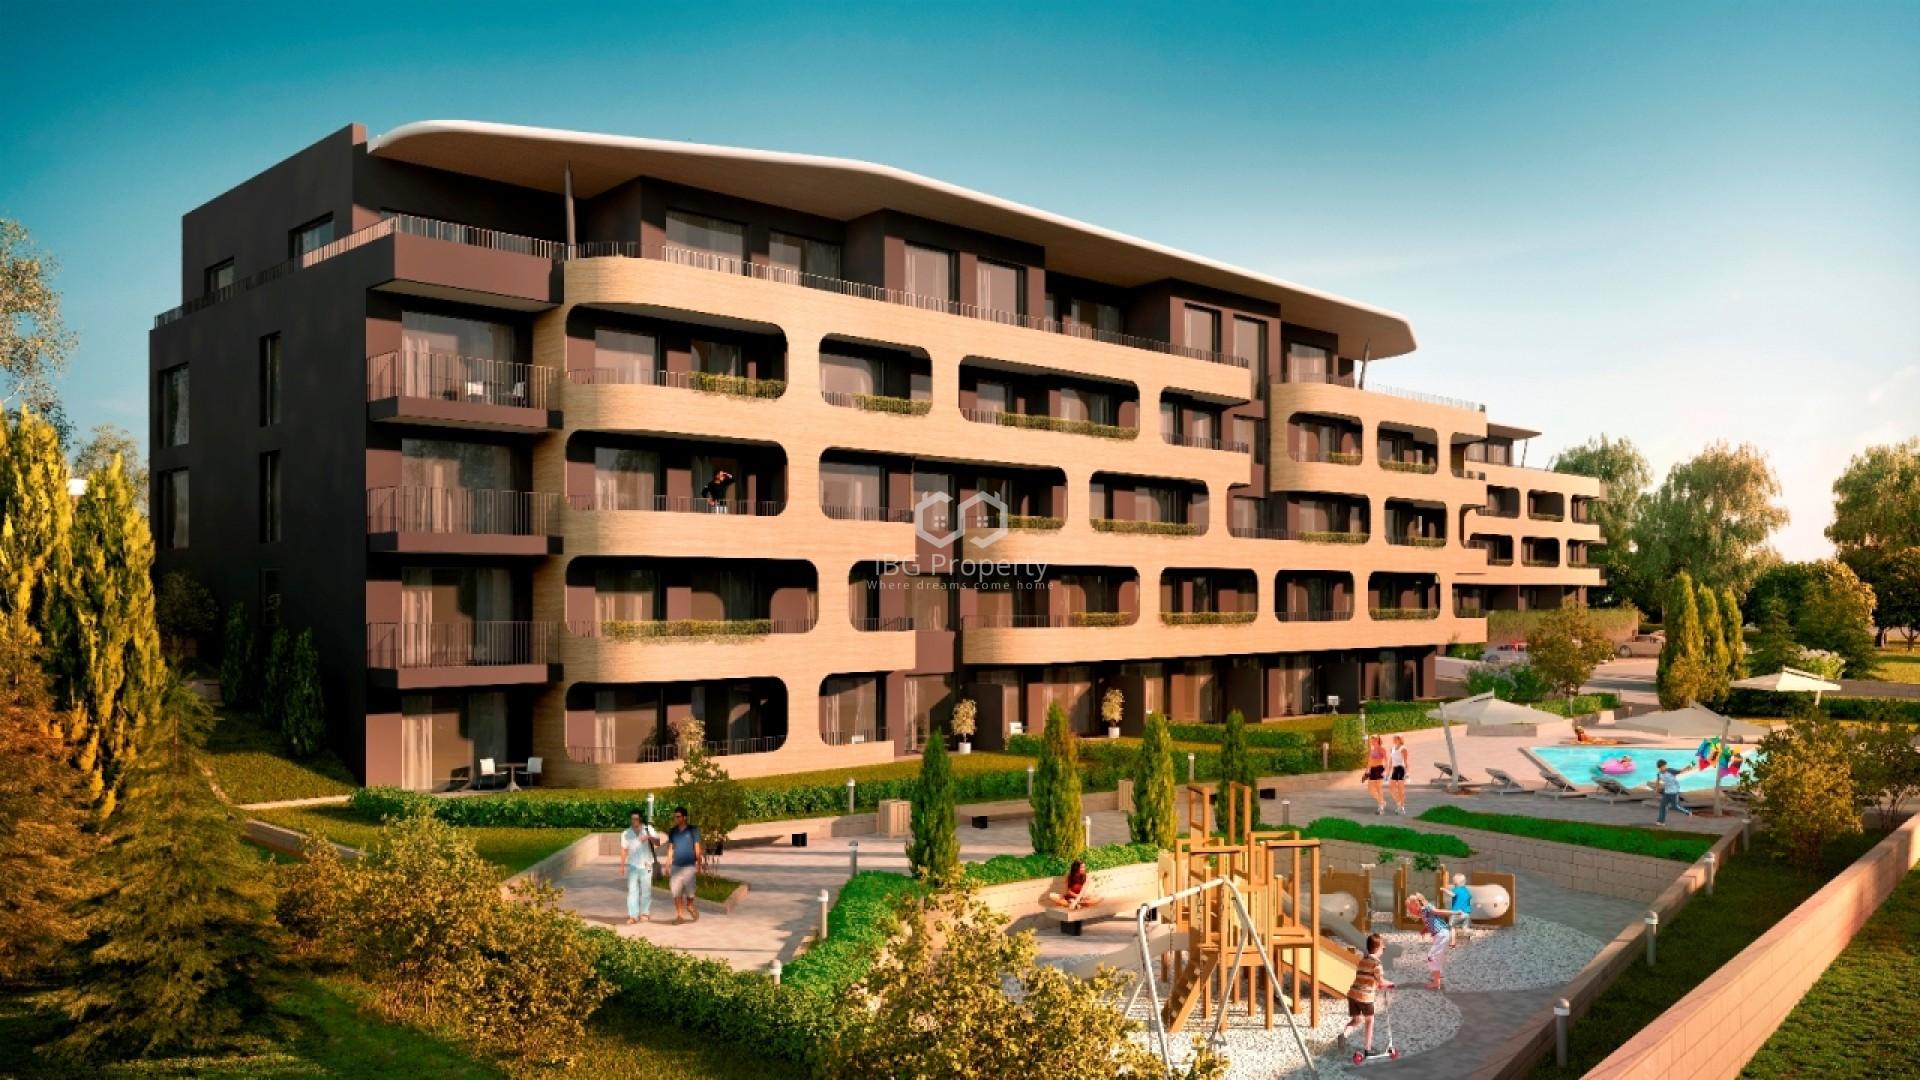 Трехкомнатная квартира Бриз Варна 99 m2